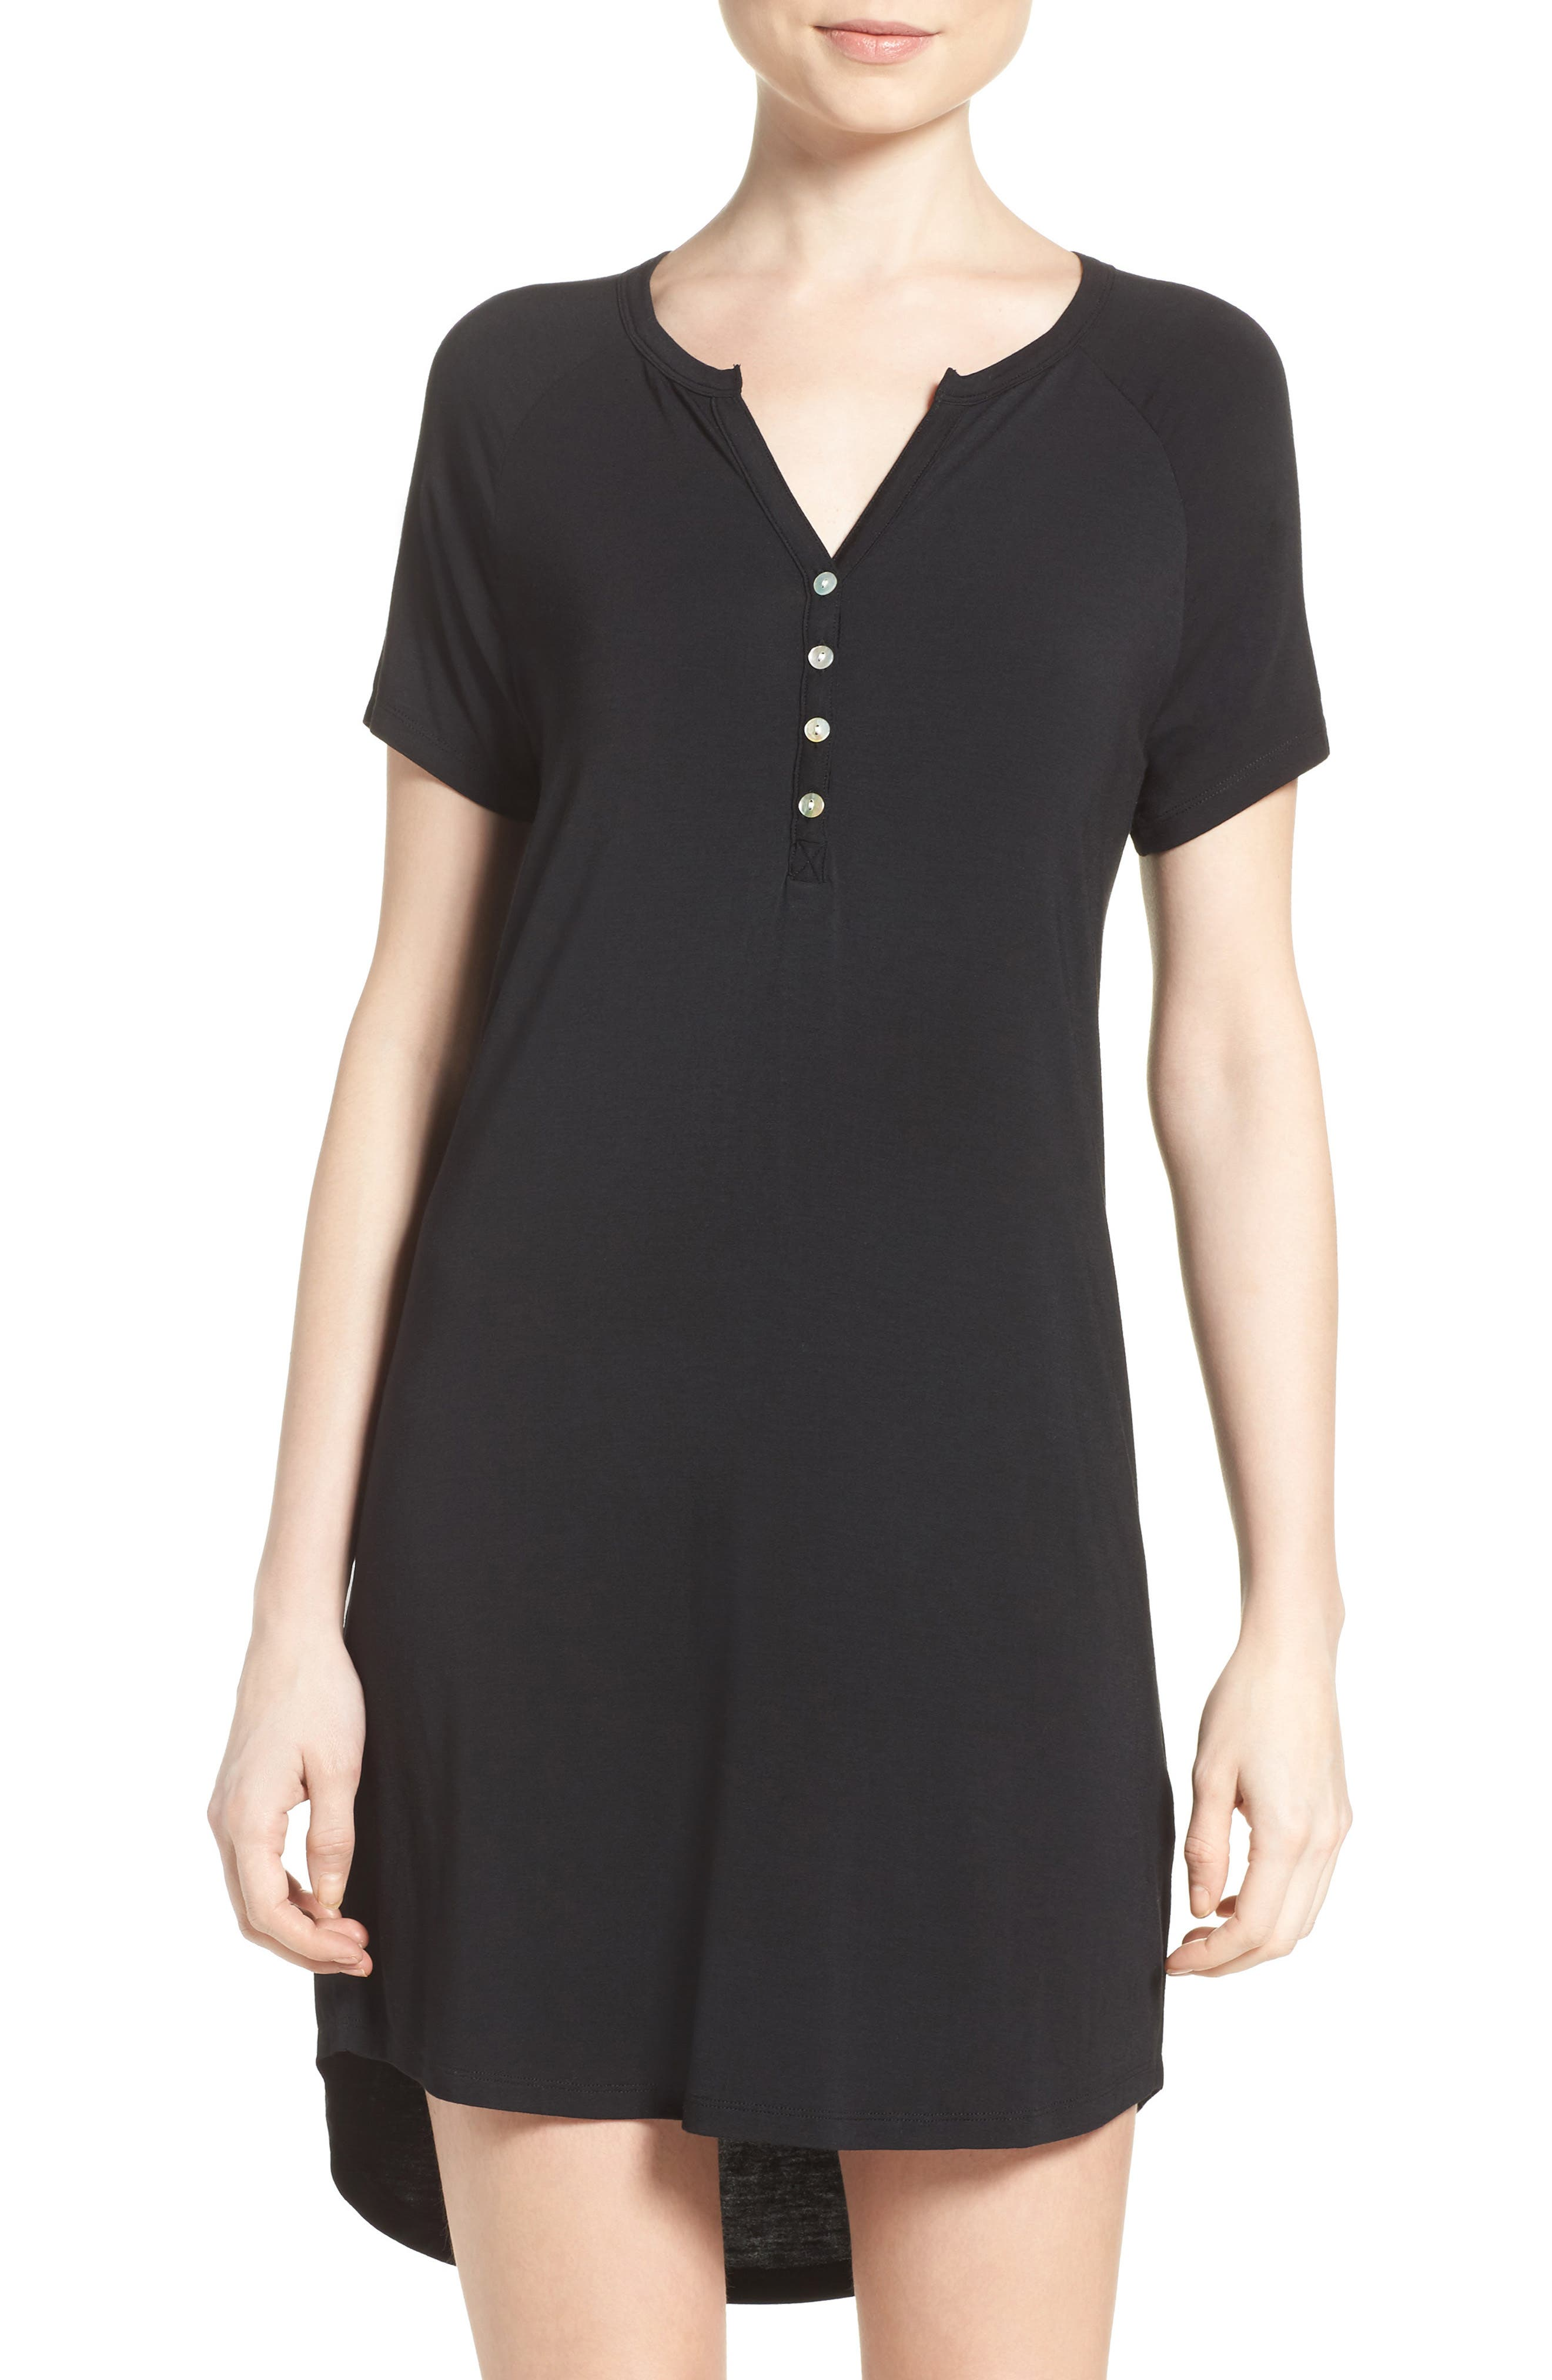 PJ SALVAGE Sleep Shirt, Main, color, BLACK